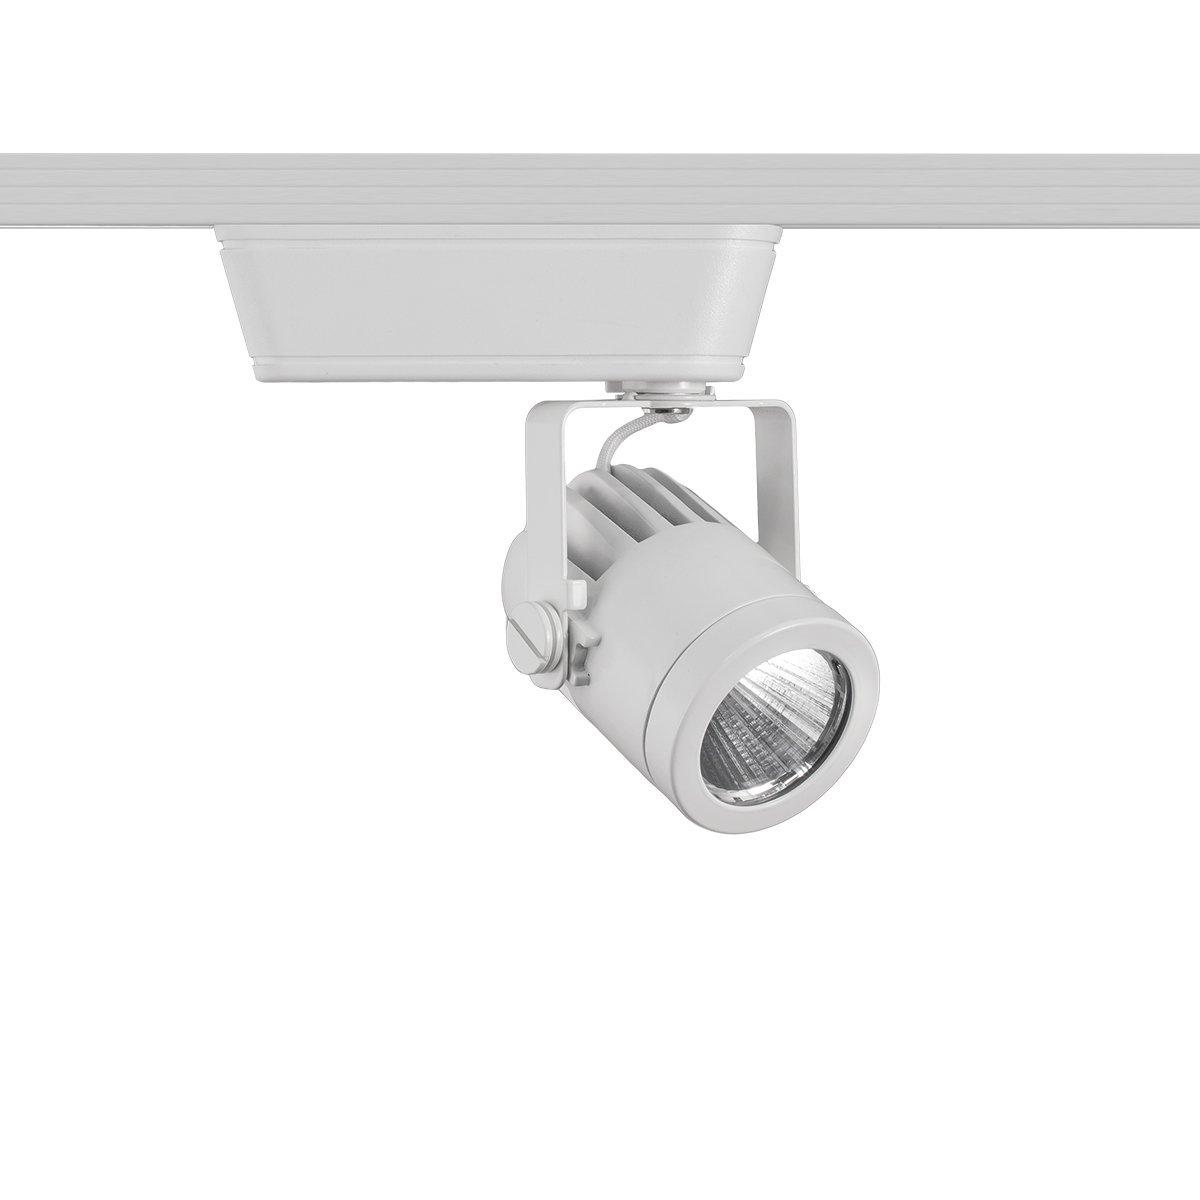 WAC Lighting J-LED160F-927-WT Precision LED Energy Star Track Fixture, White by WAC Lighting (Image #1)